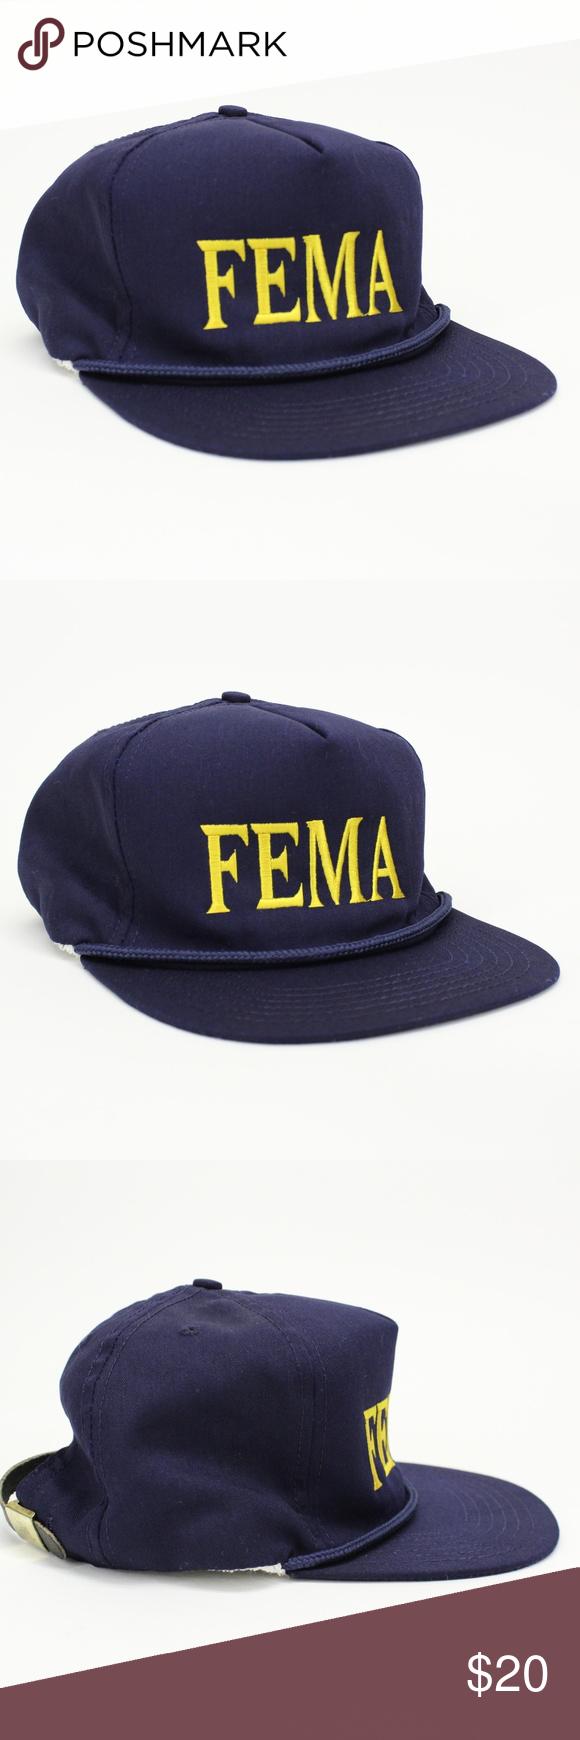 Vintage Fema Federal Emergency Hat Vintage Accessories Hats Vintage Vintage Men